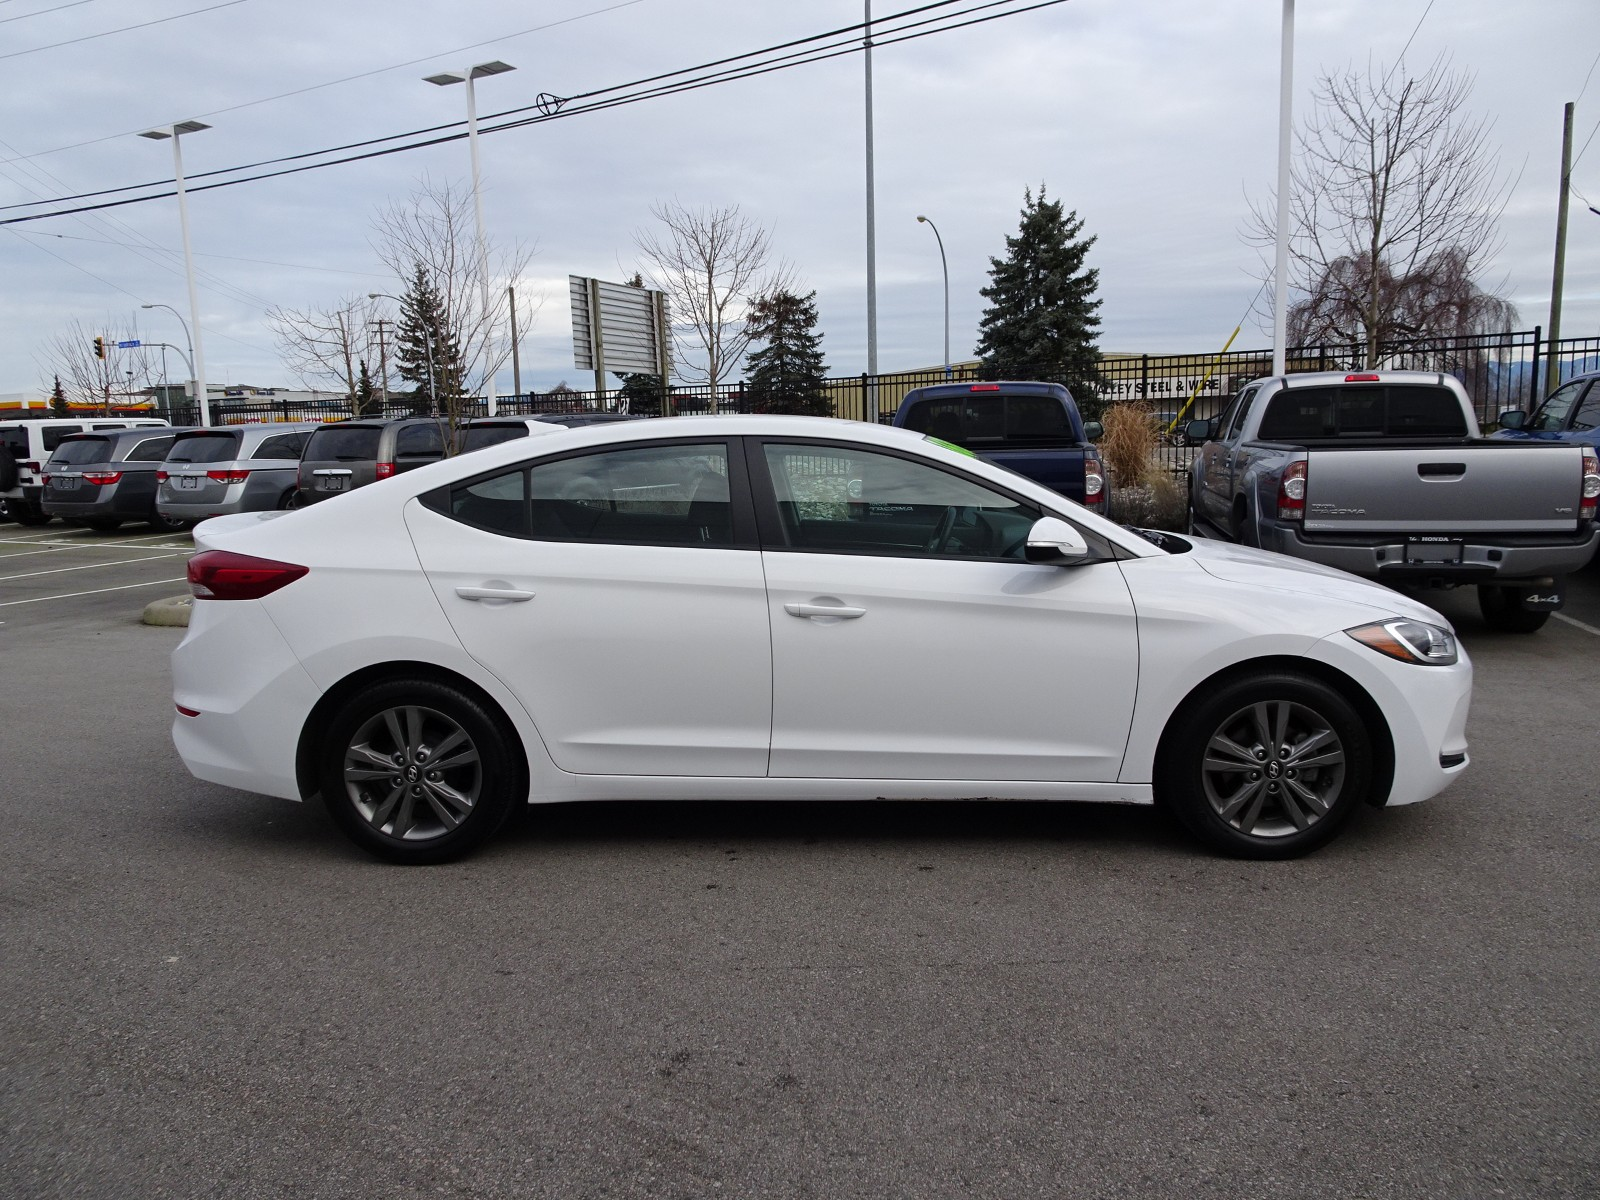 Used 2017 Hyundai Elantra in Abbotsford,BC